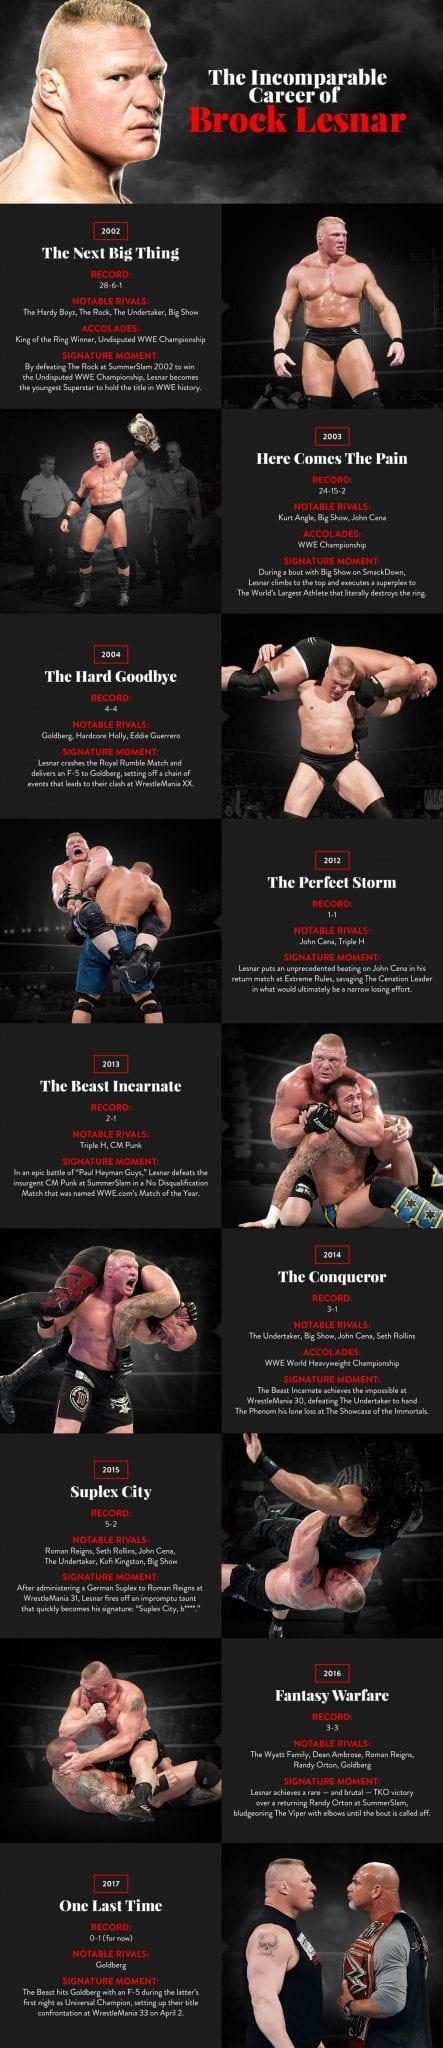 Brock Lesnar's Career Infographic